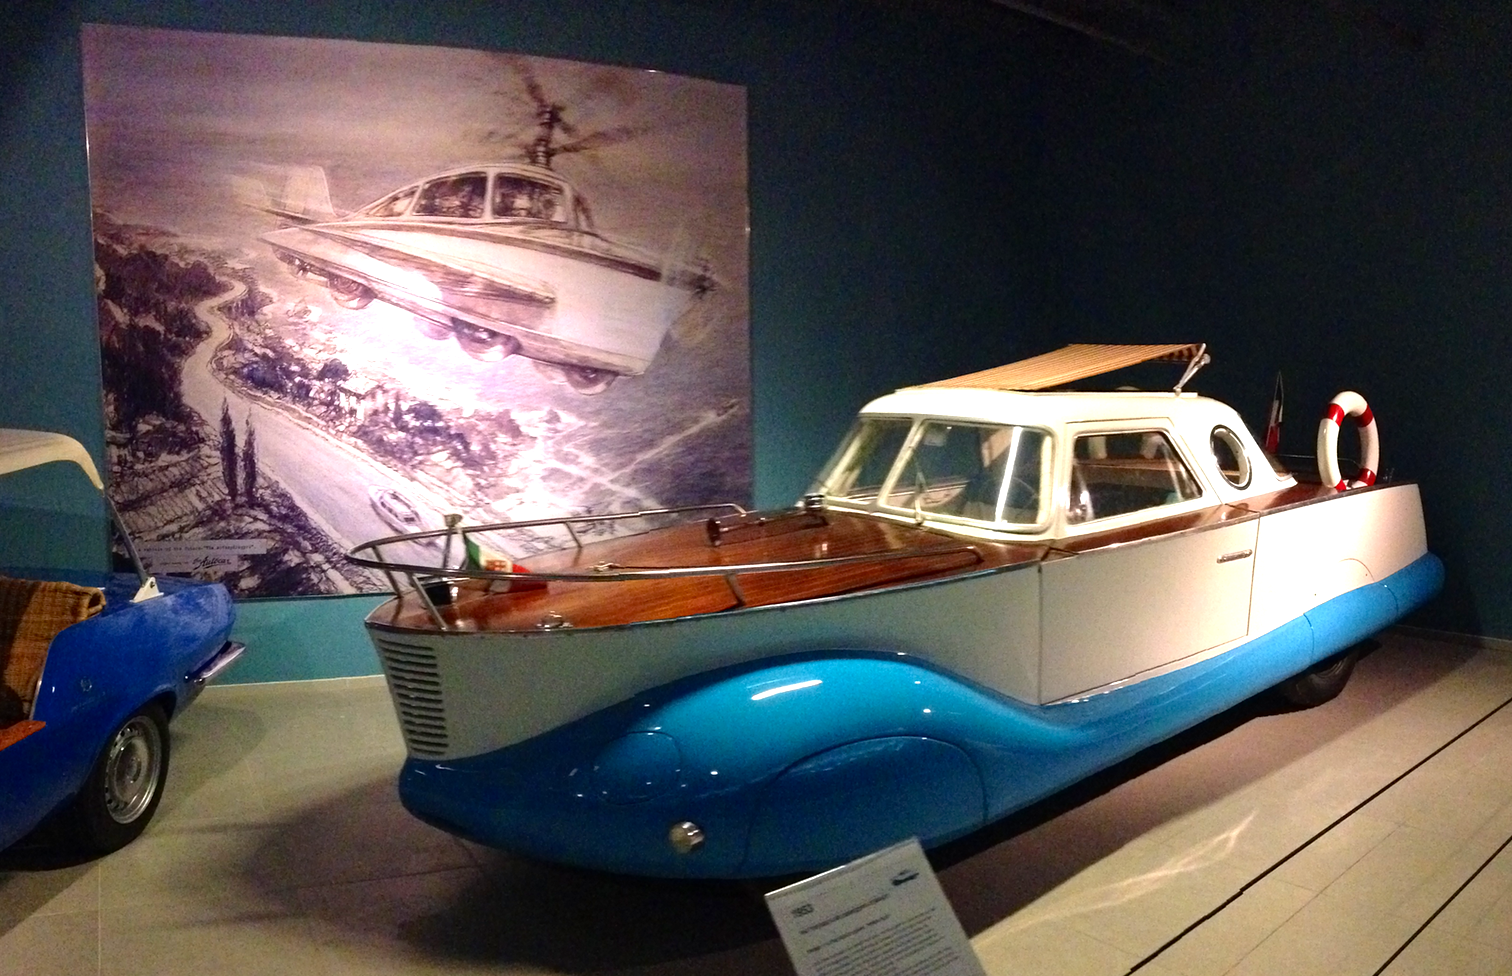 1953 Fiat 1100 Boat-car Carrozzeria Coriasco